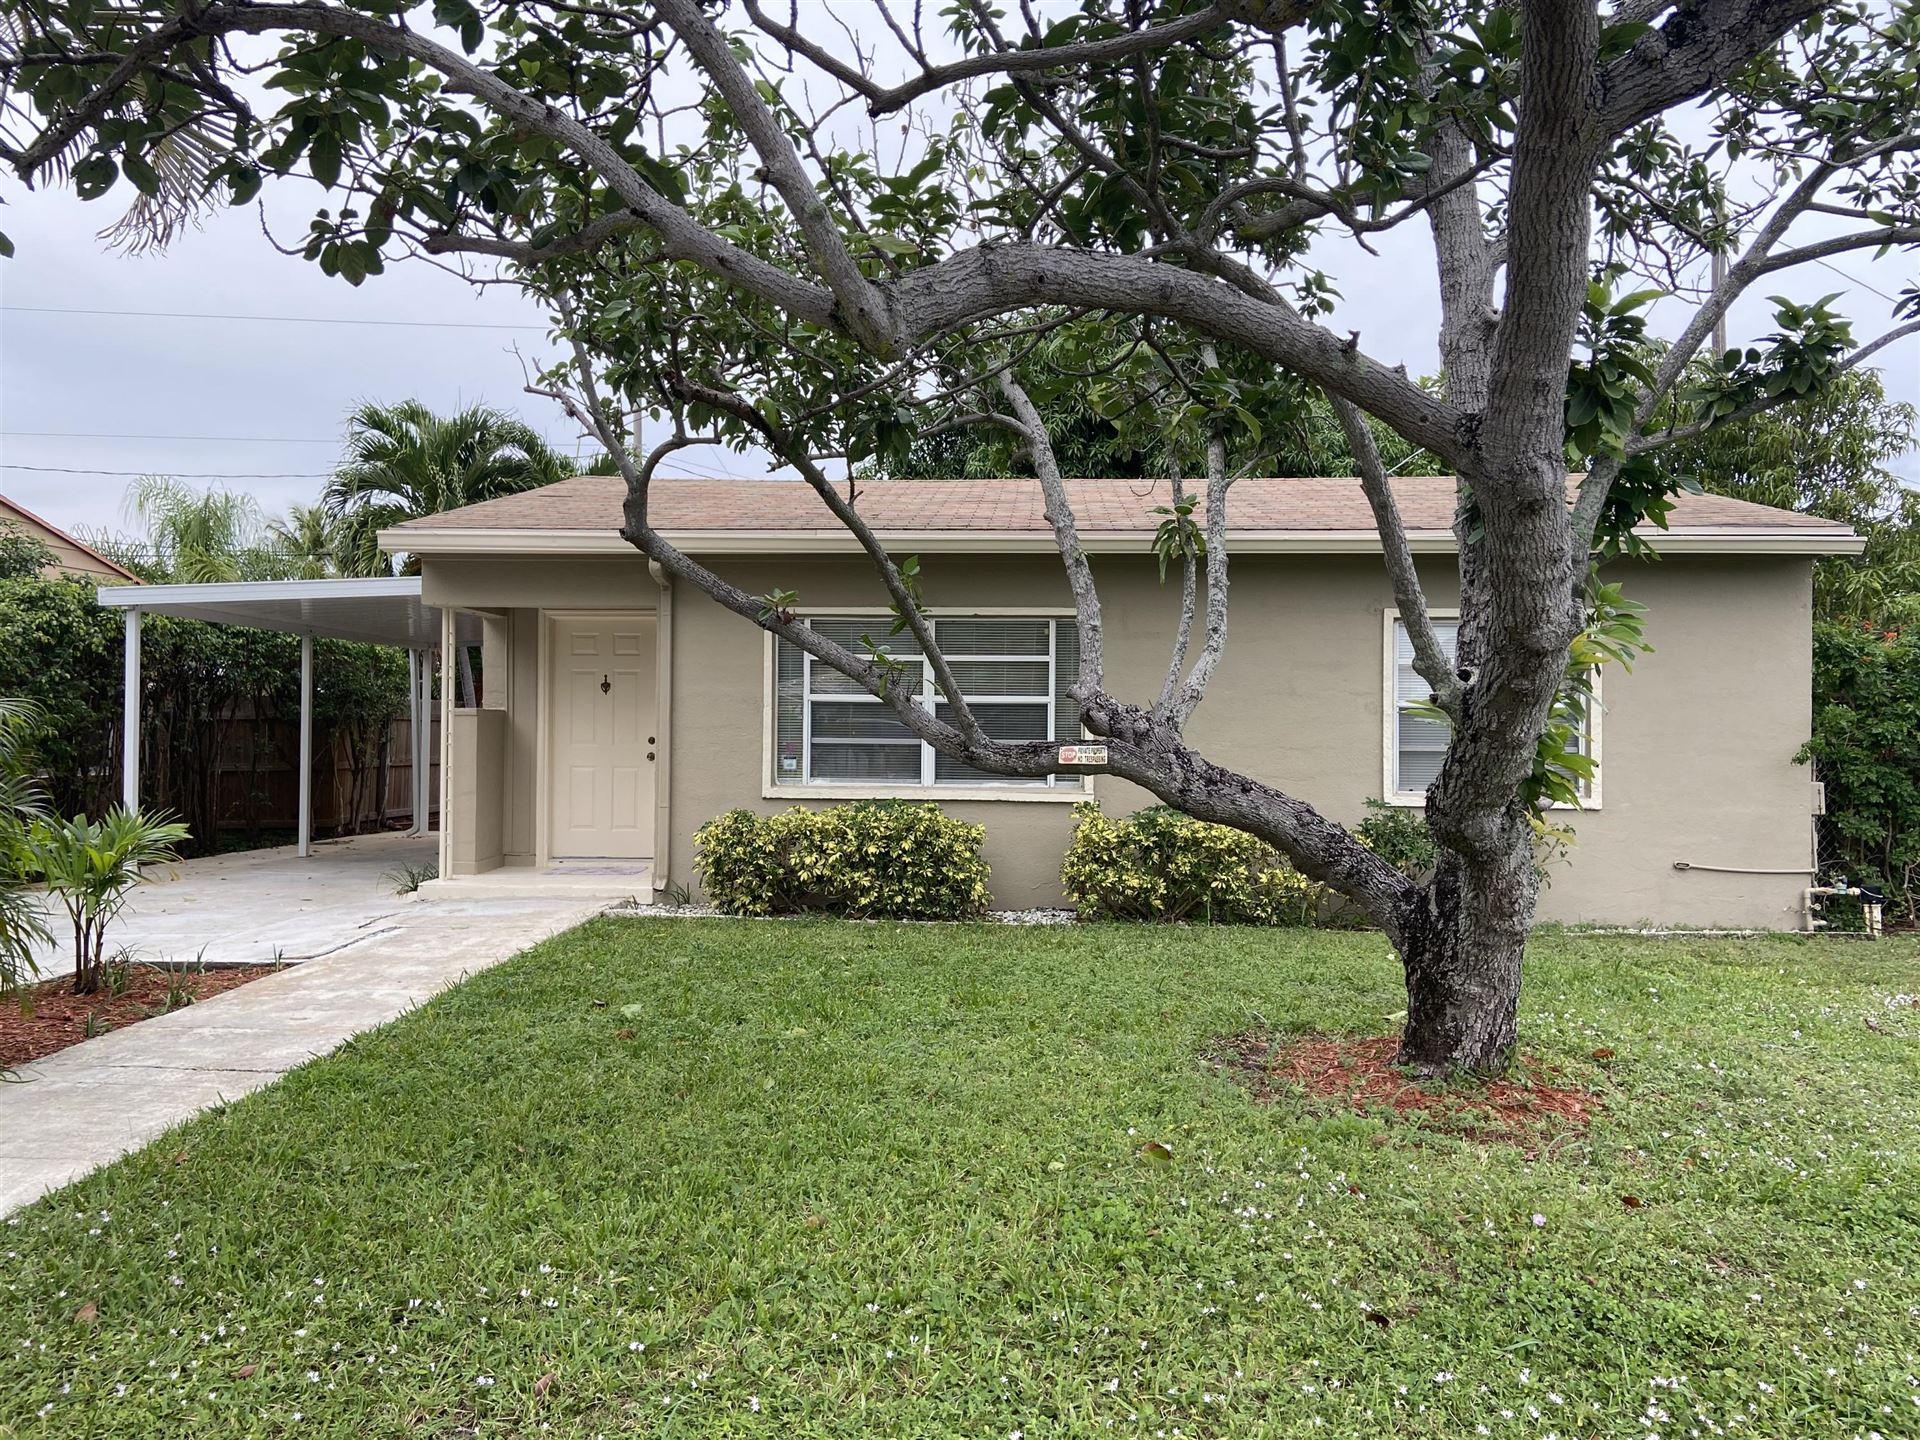 605 Fairfax Road, West Palm Beach, FL 33405 - MLS#: RX-10717359